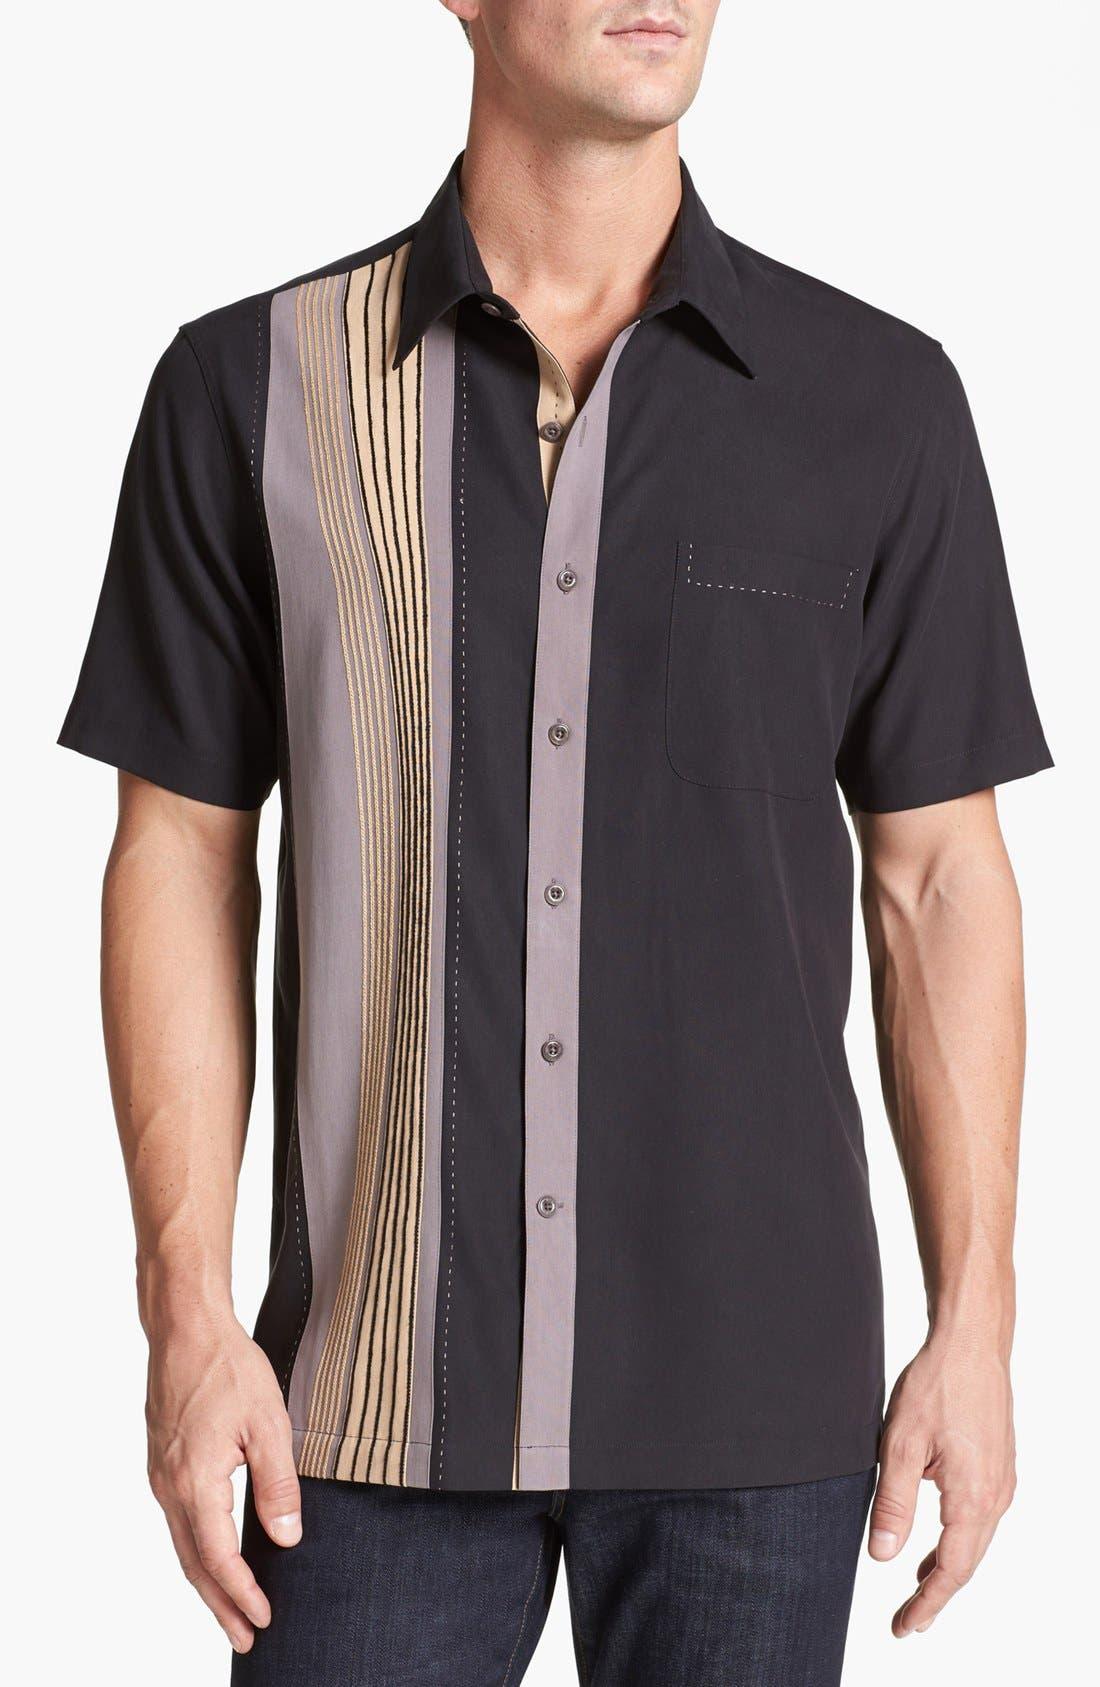 Alternate Image 1 Selected - Nat Nast 'Barzini' Silk Campshirt